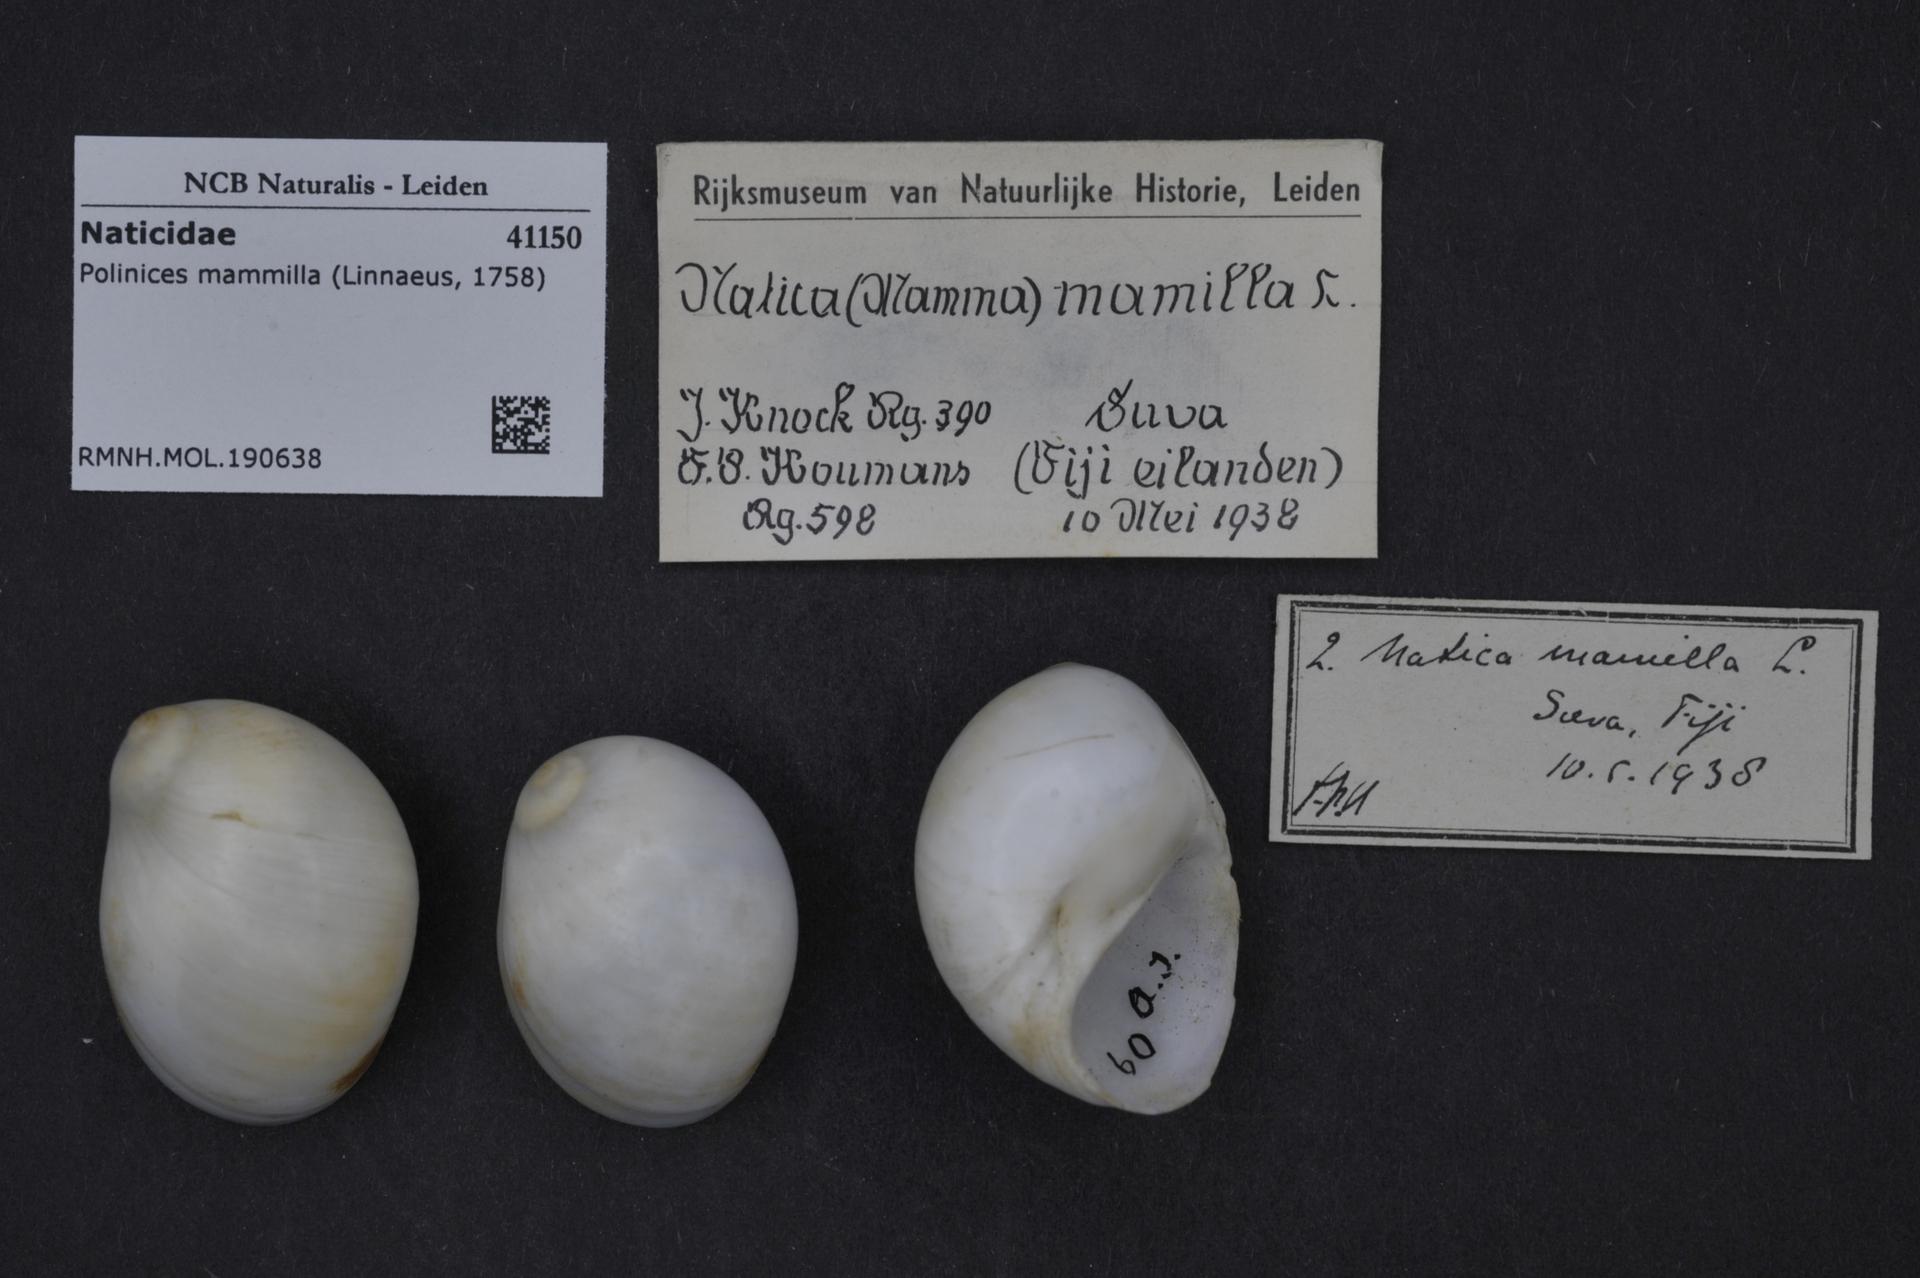 RMNH.MOL.190638 | Polinices mammilla (Linnaeus, 1758)